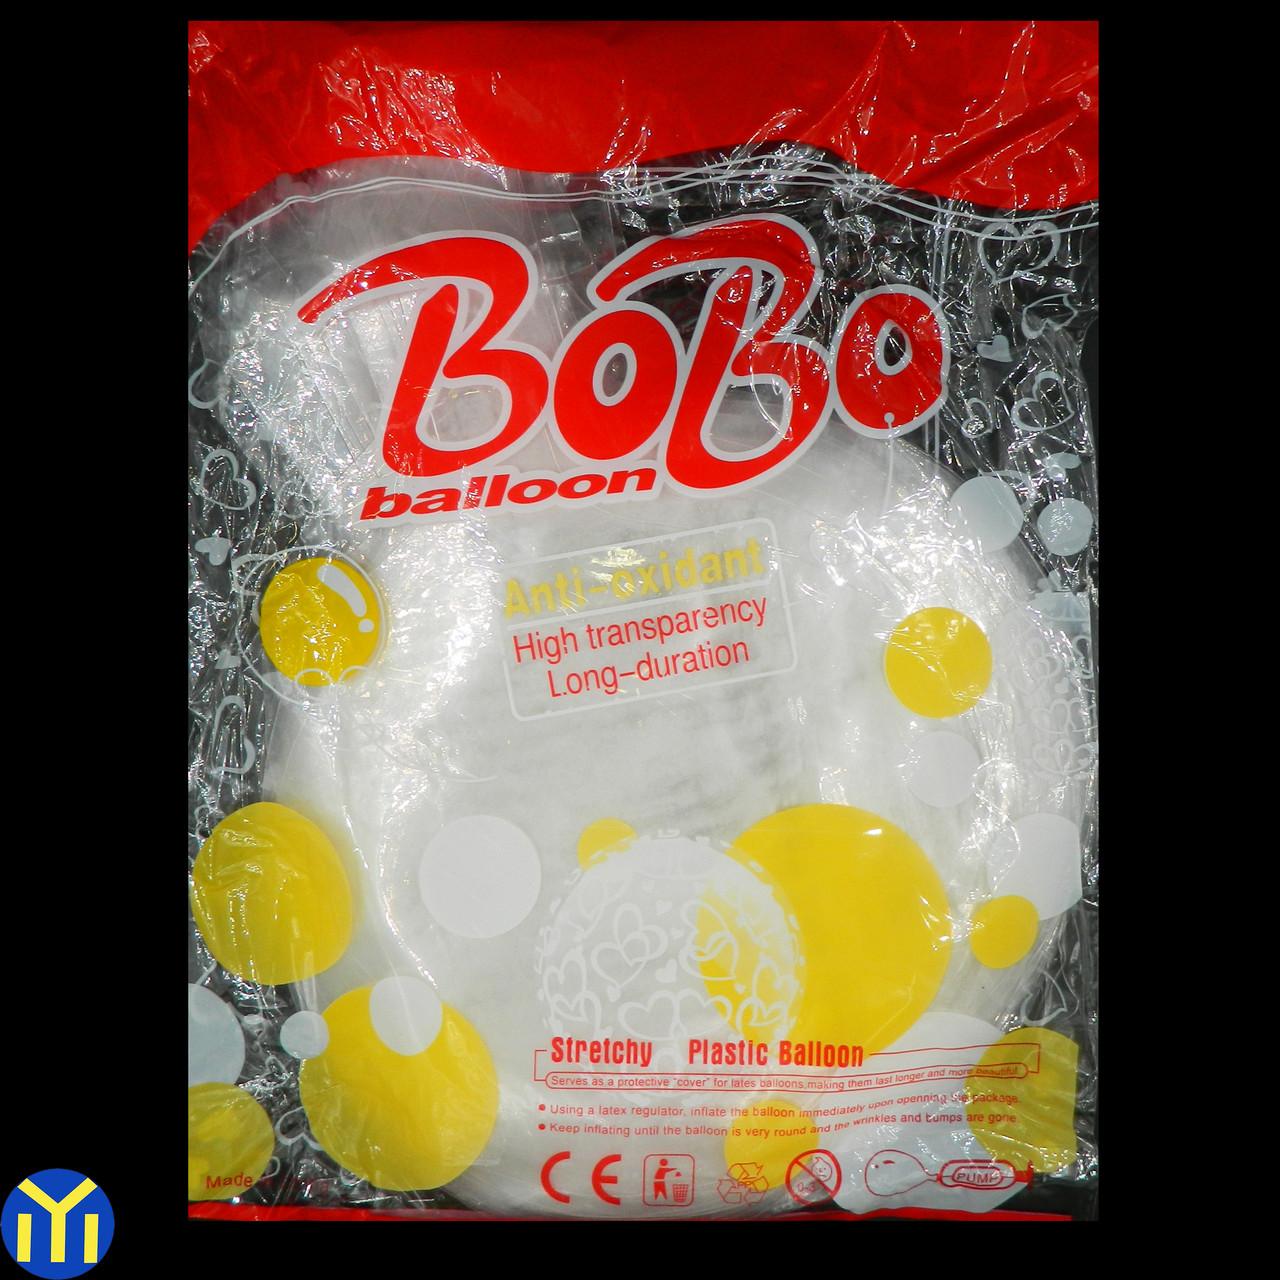 Шарики, прозрачные запаски, Bobo